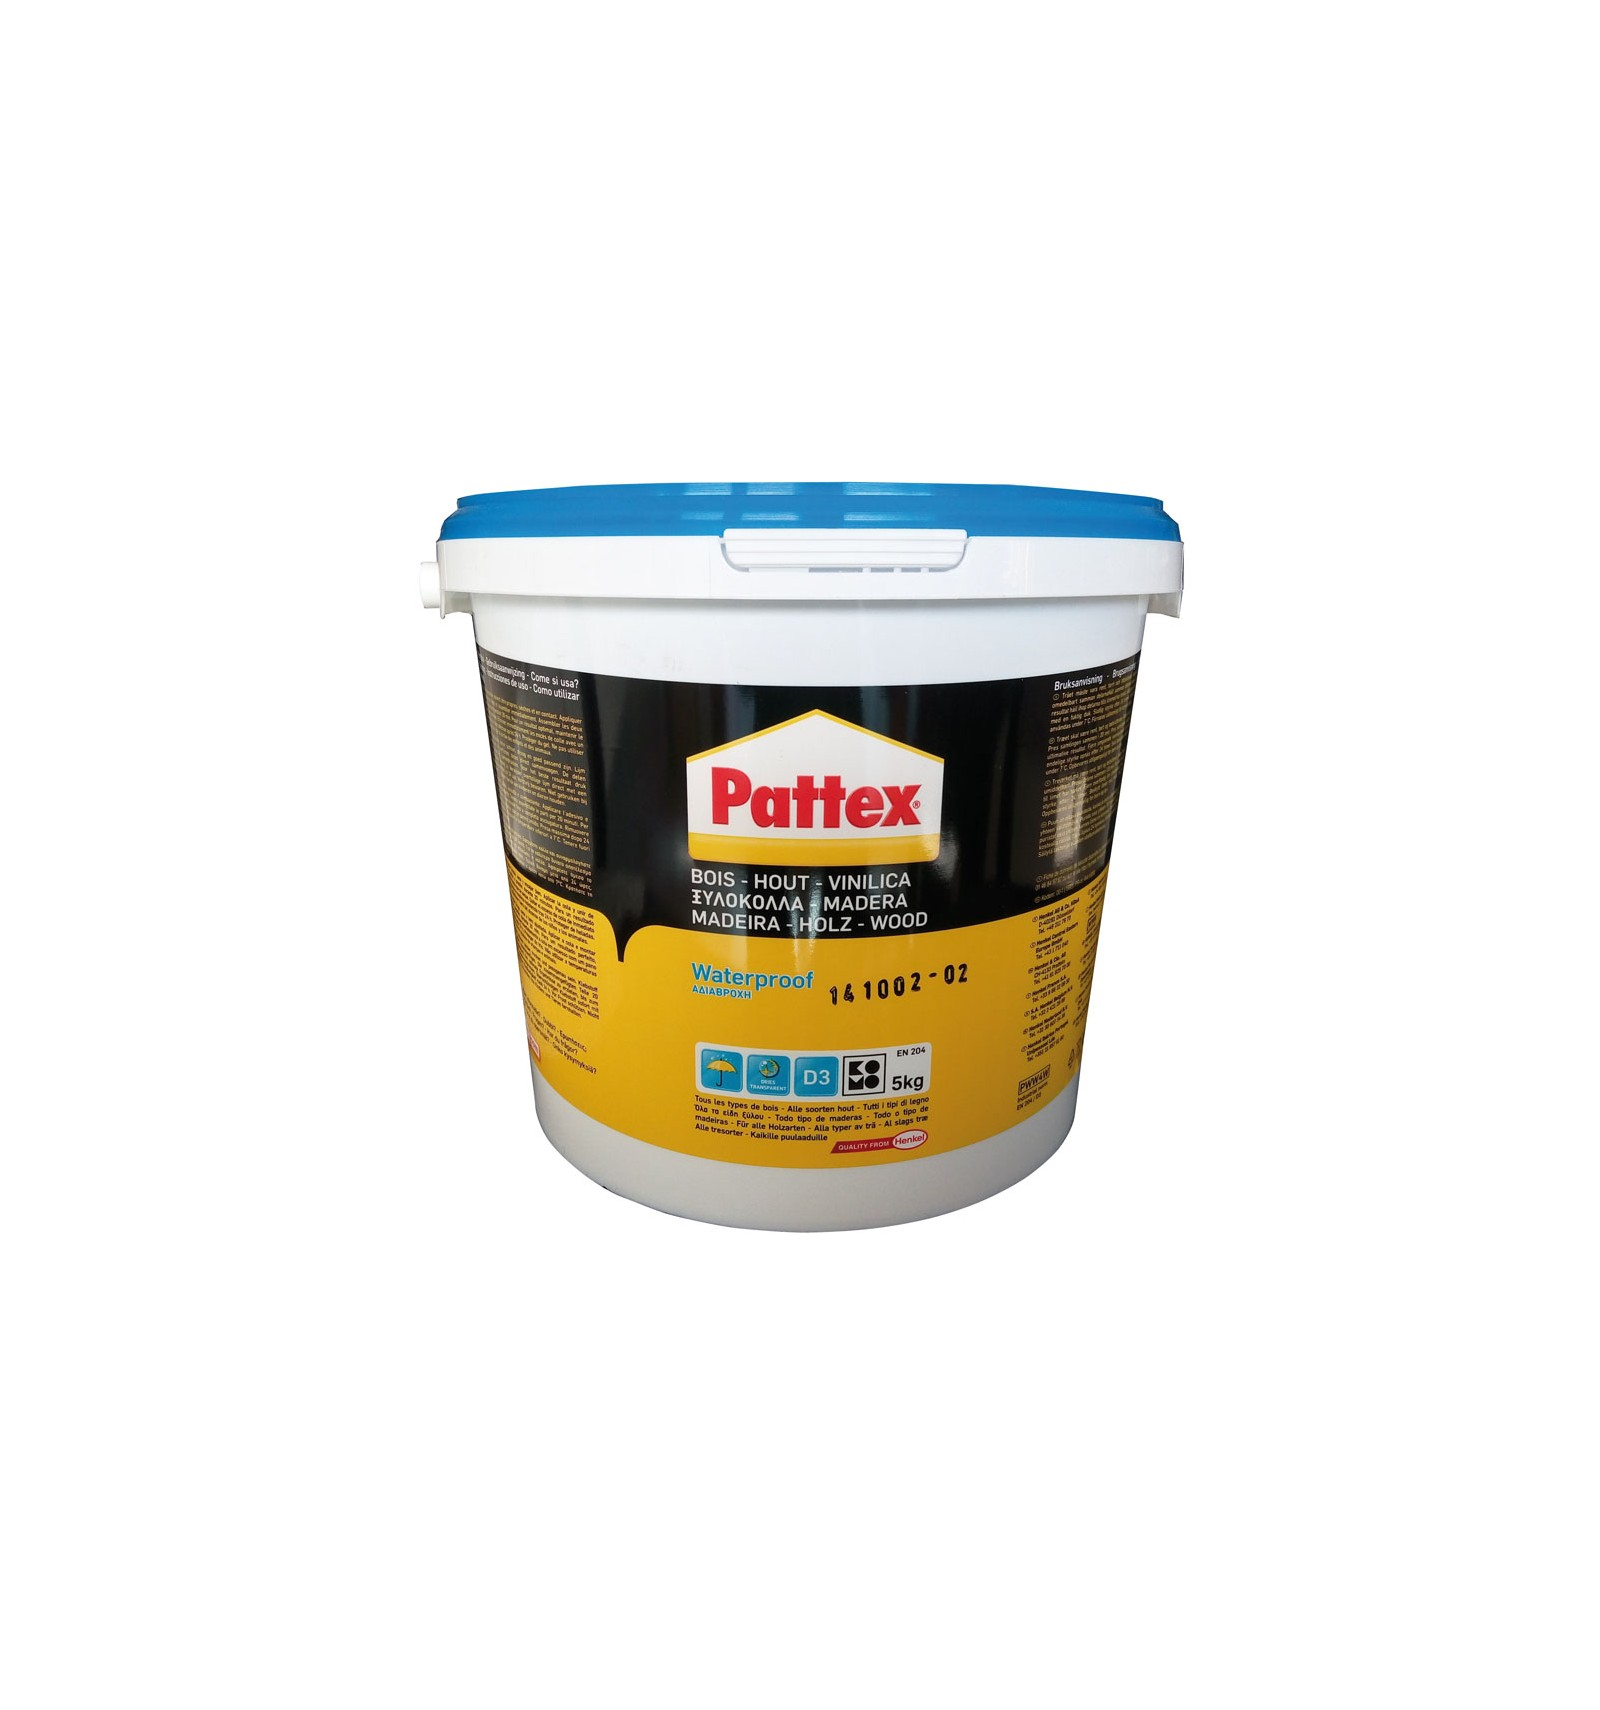 Pattex 5kg